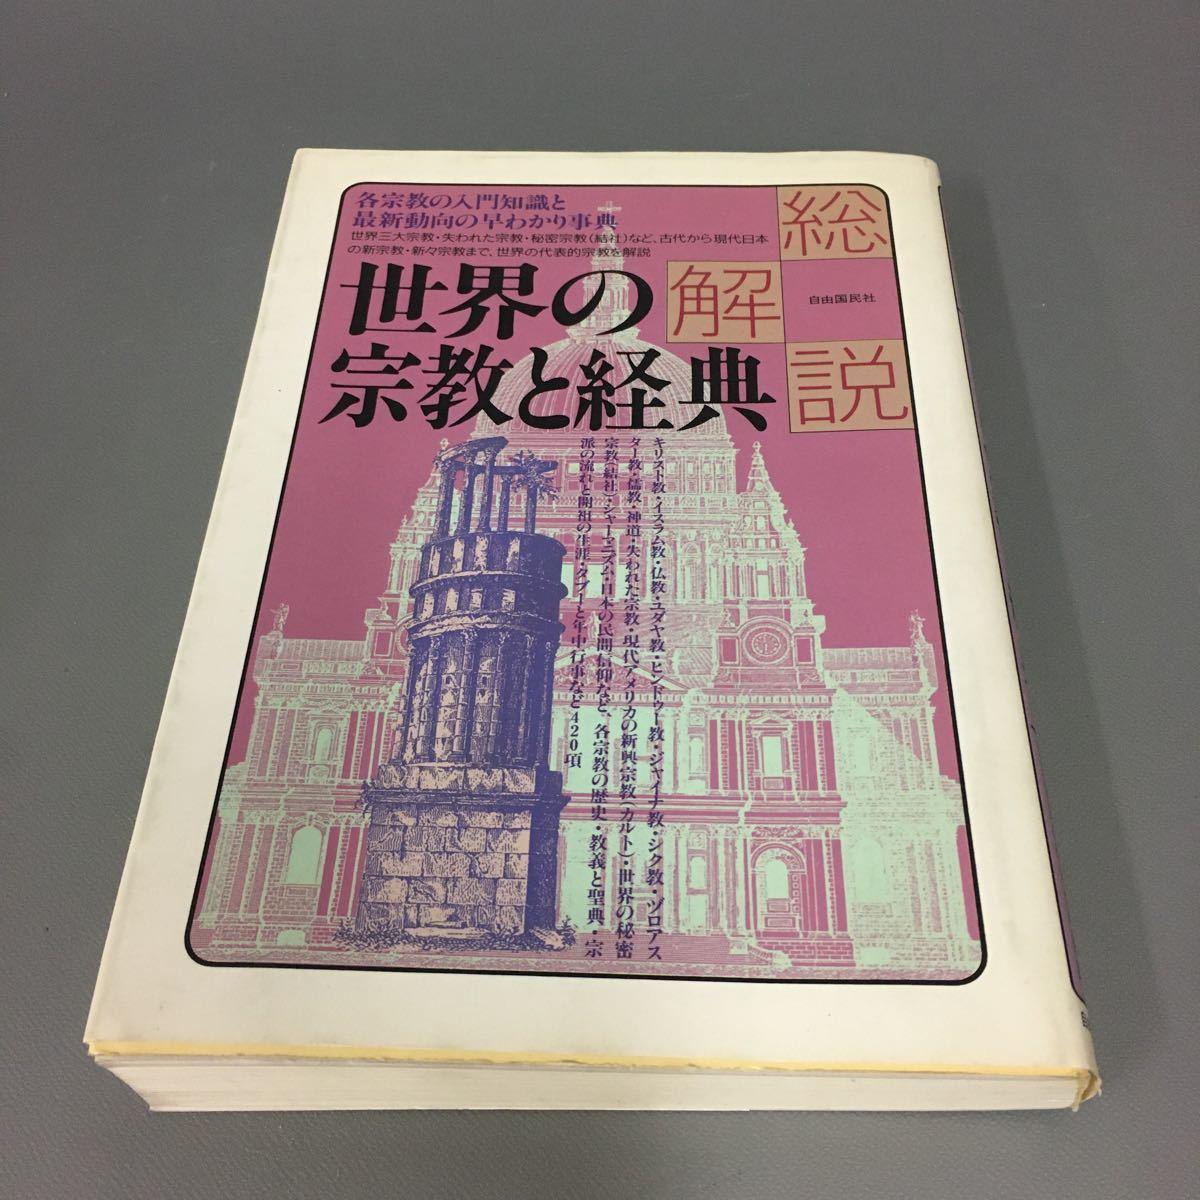 A) 世界の宗教と経典・総解説 1991年11月20日発行 自由国民社 長谷川秀記_画像1